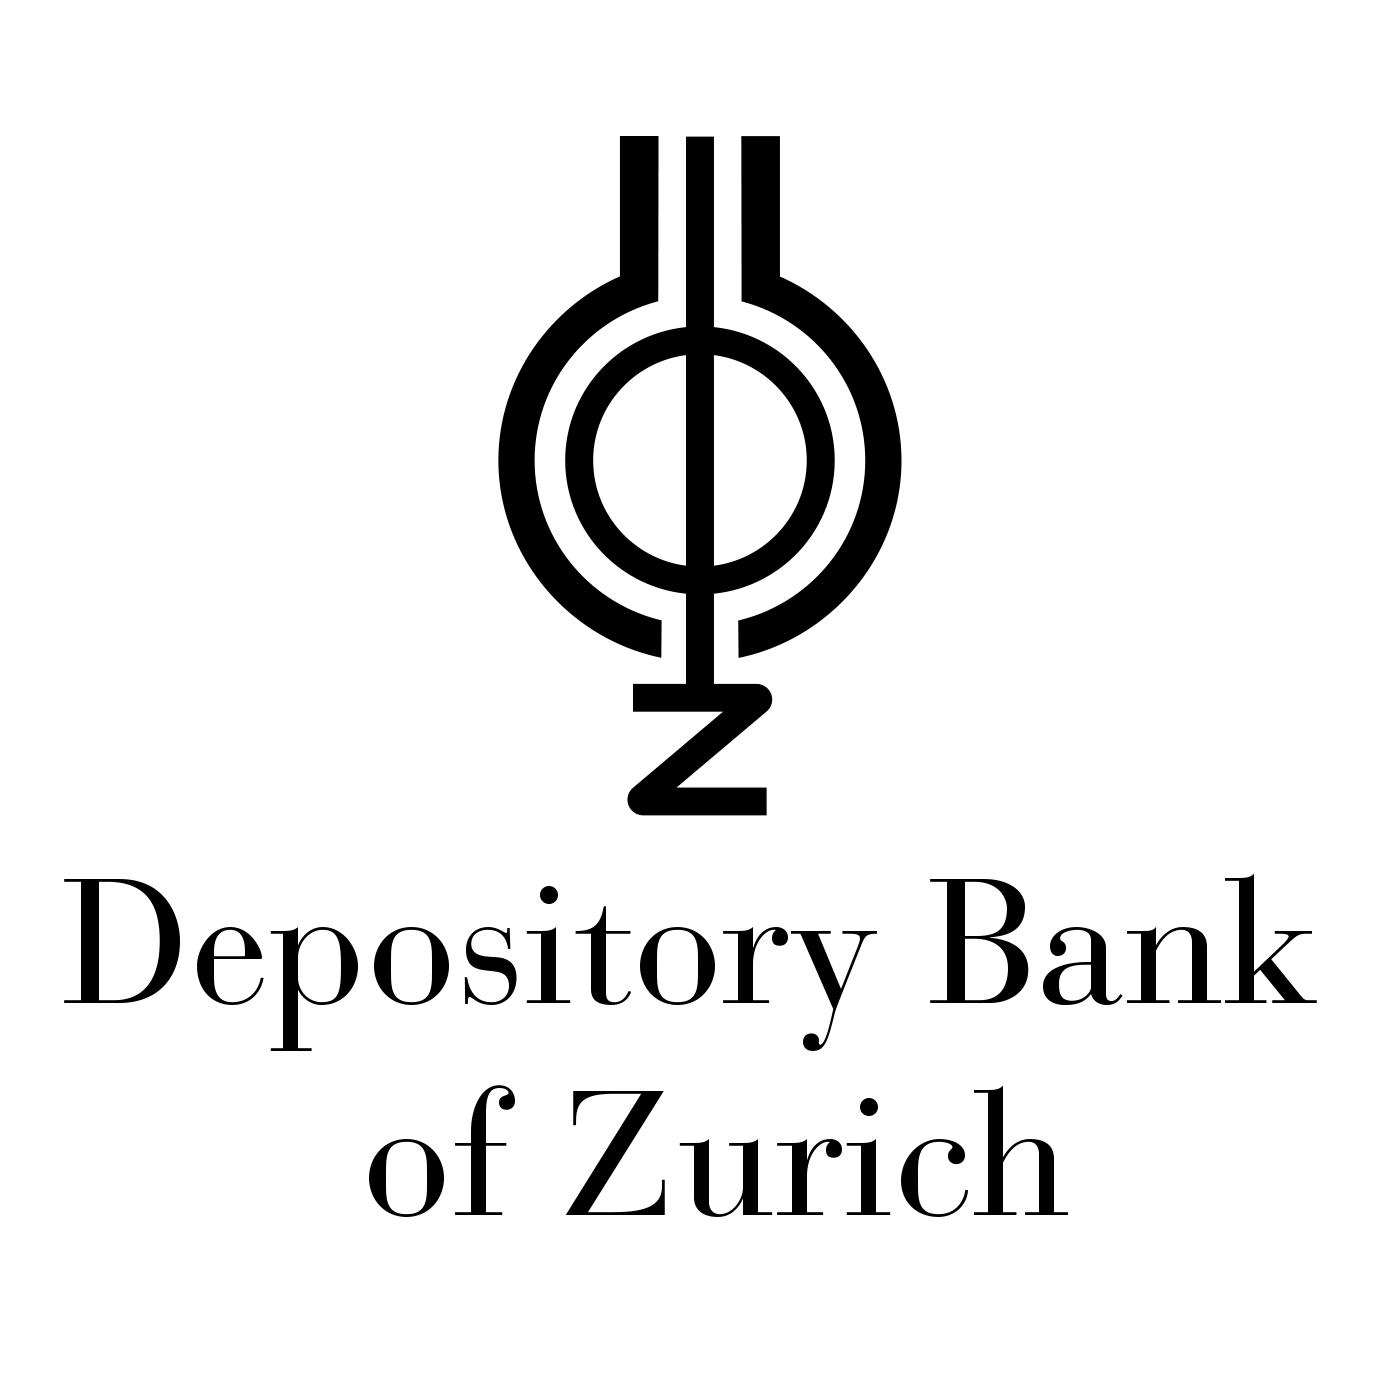 Depository bank of zurich the dan brown wiki fandom powered by deposit zurich johnlangdon buycottarizona Image collections